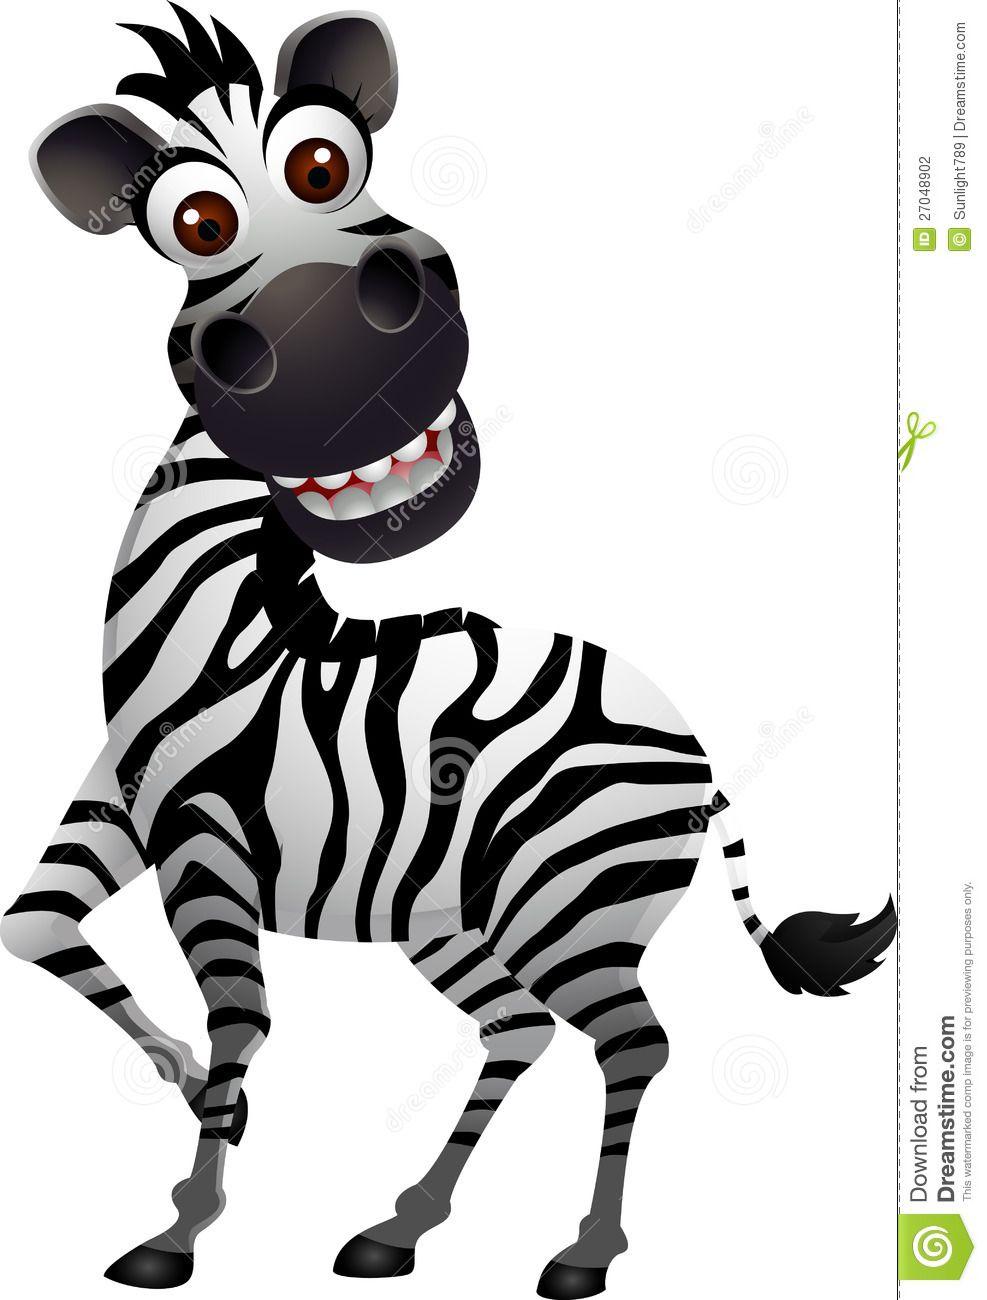 Funny and Cute Zebra Funny zebra cartoon Zebra